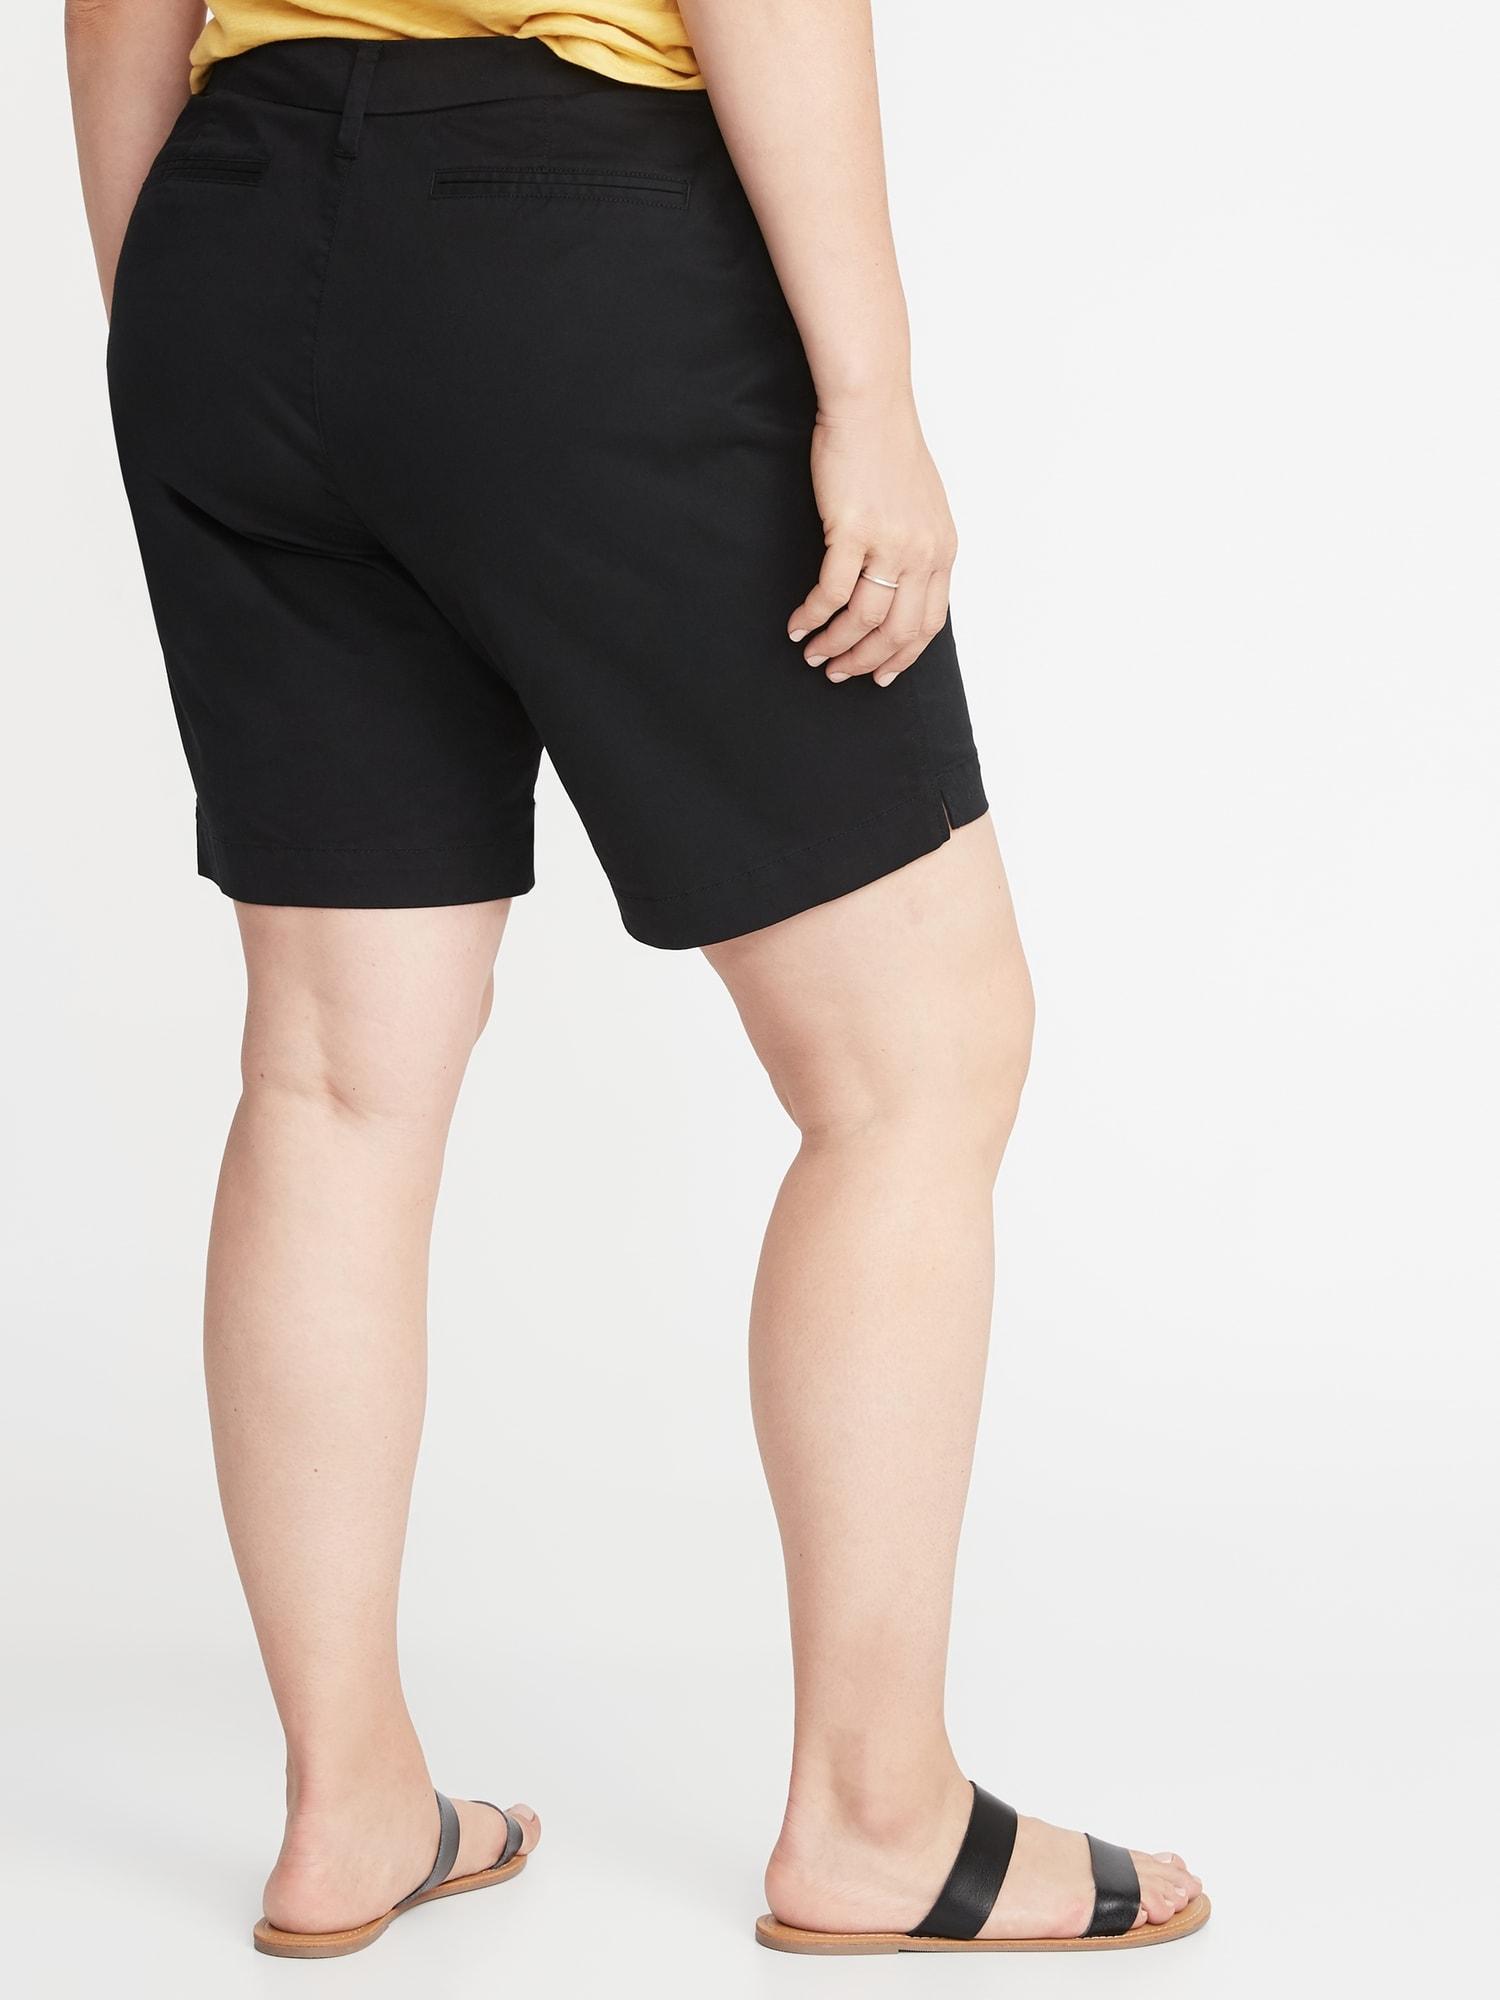 b7107def731 Mid-Rise Everyday Twill Plus-Size Shorts - 9-inch inseam